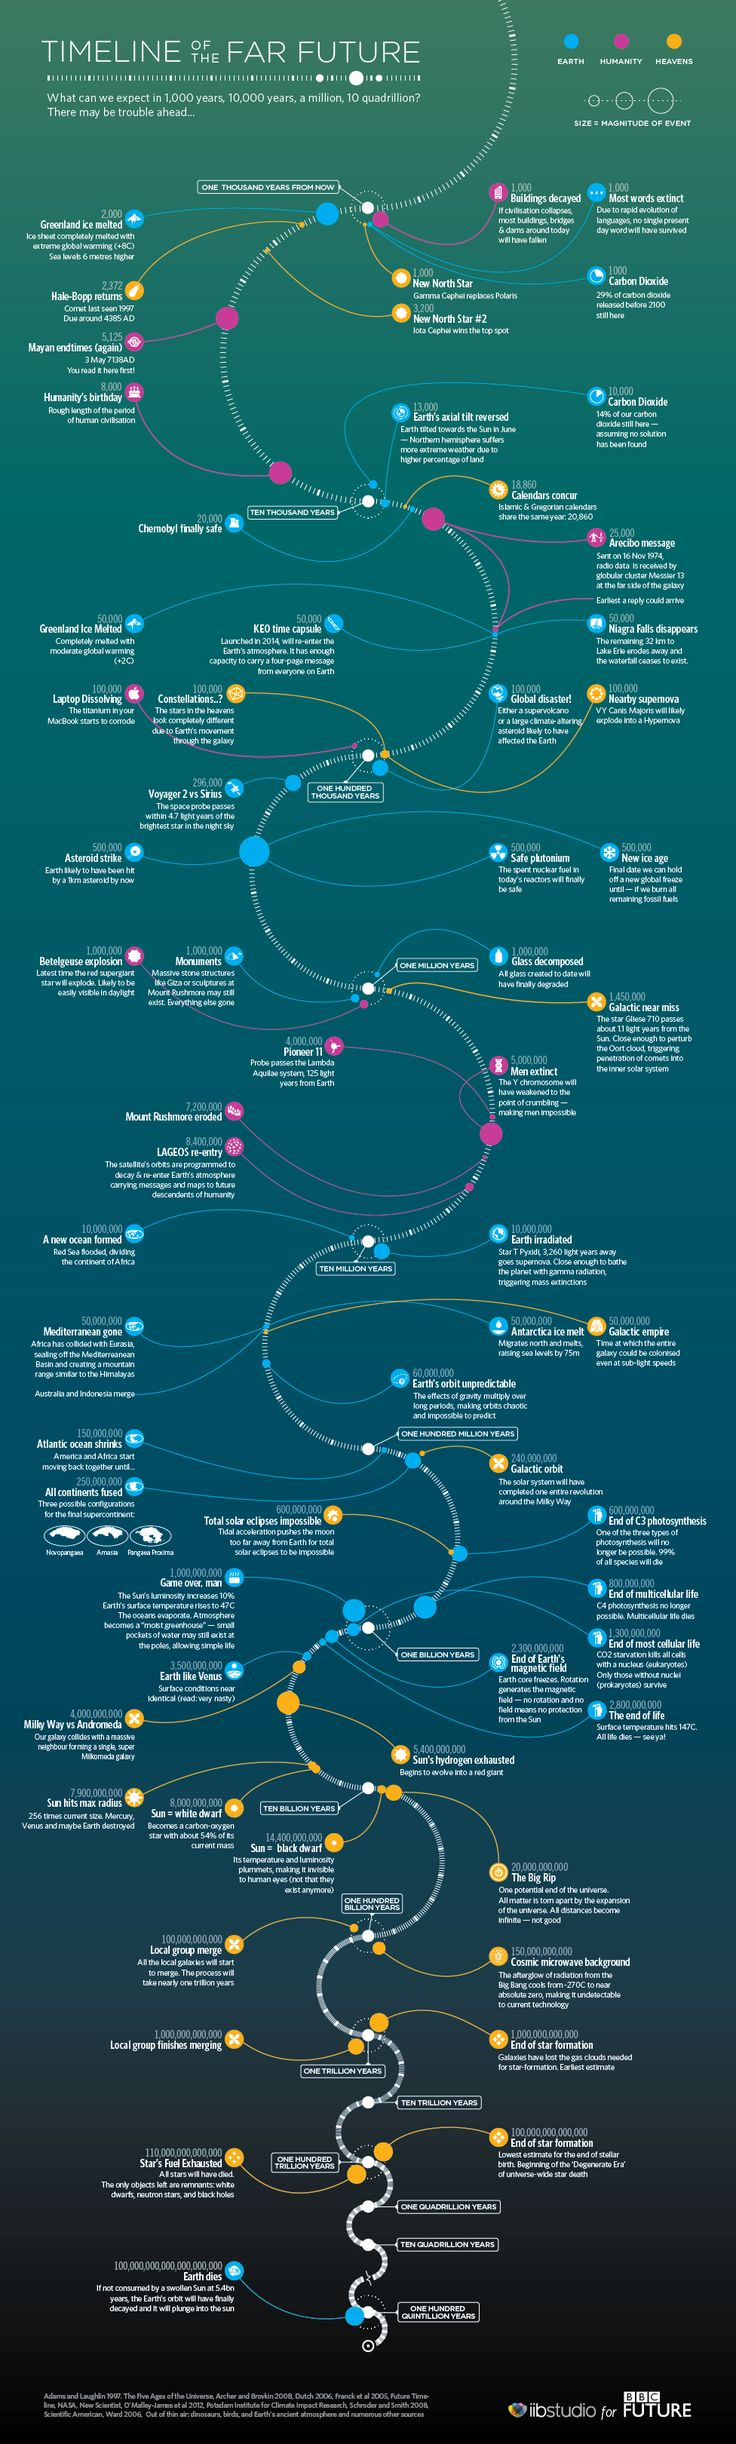 Timeline du futur